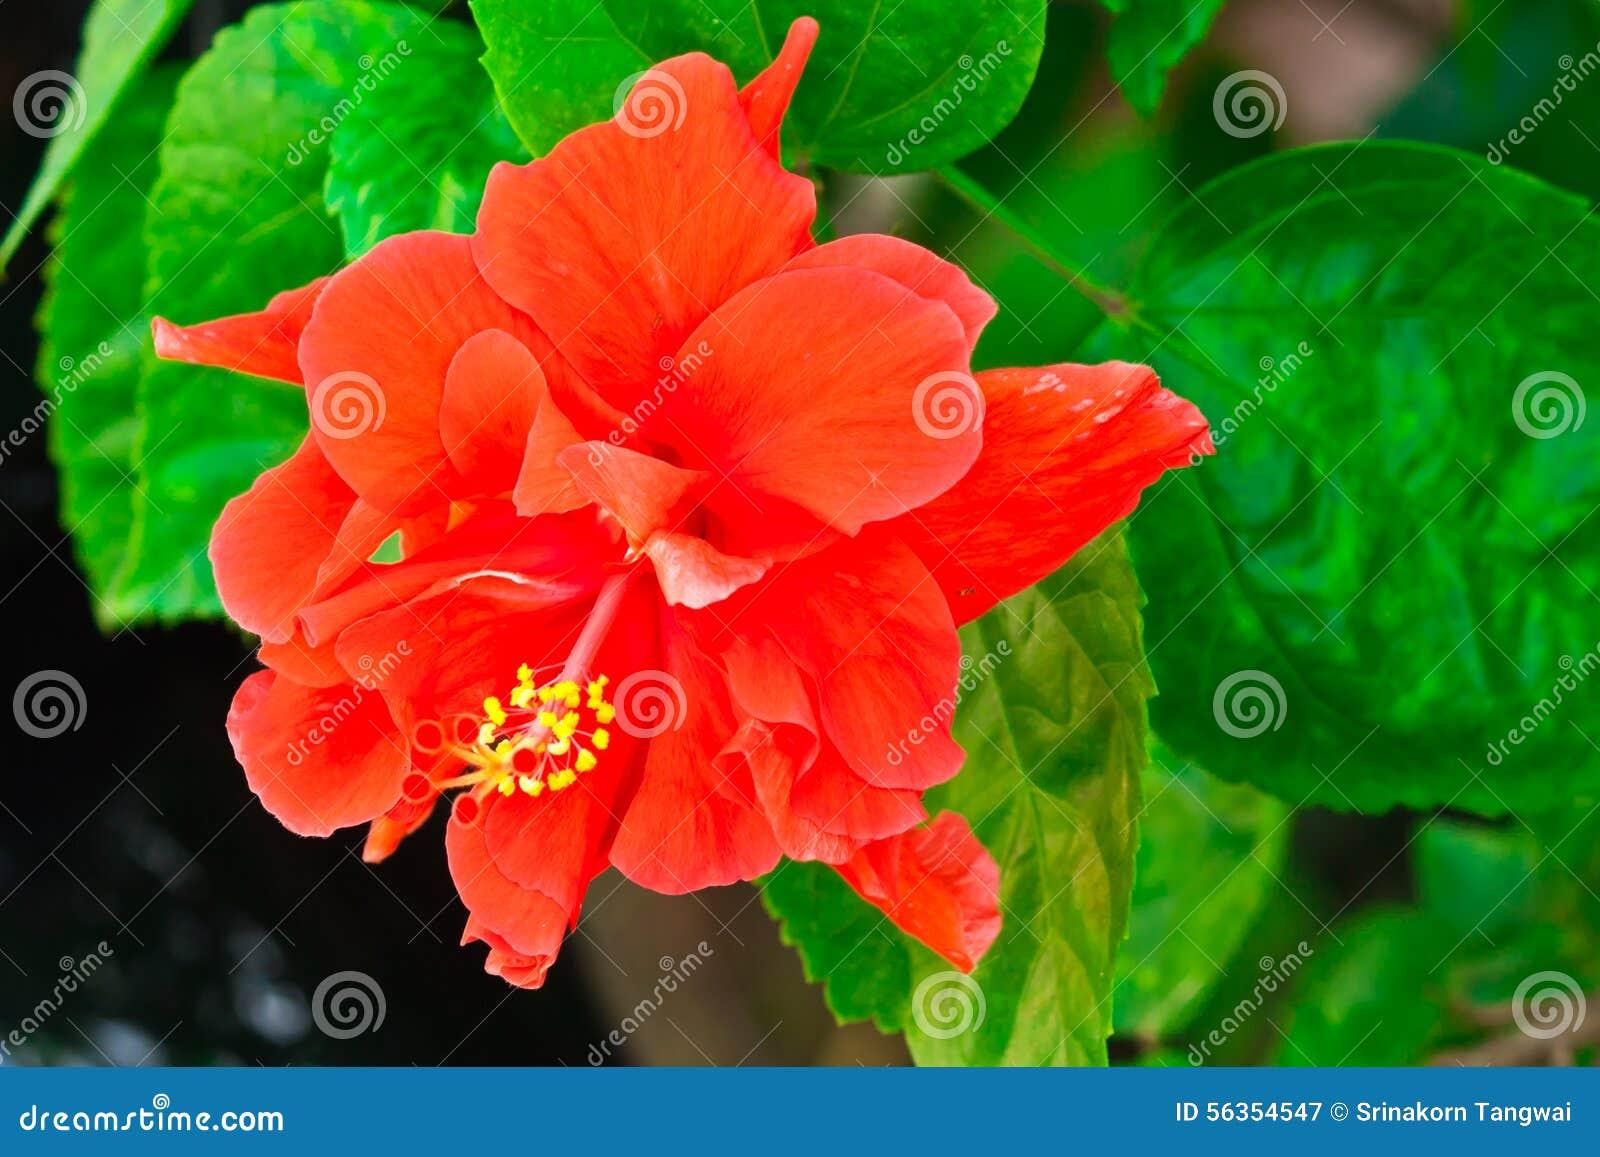 Beautiful red hawaiian hibiscus flower stock image image of download beautiful red hawaiian hibiscus flower stock image image of hibiscus delicate 56354547 izmirmasajfo